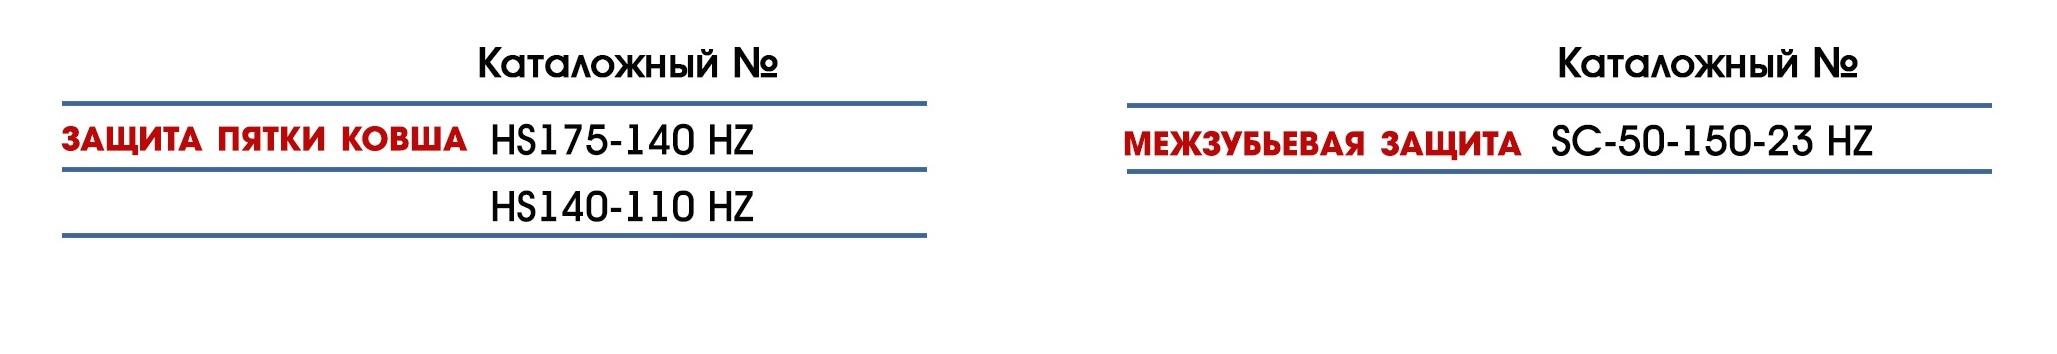 Межзубъевая защита для JCB, Volvo, CAT, Hyundai, Hitachi, Komatsu